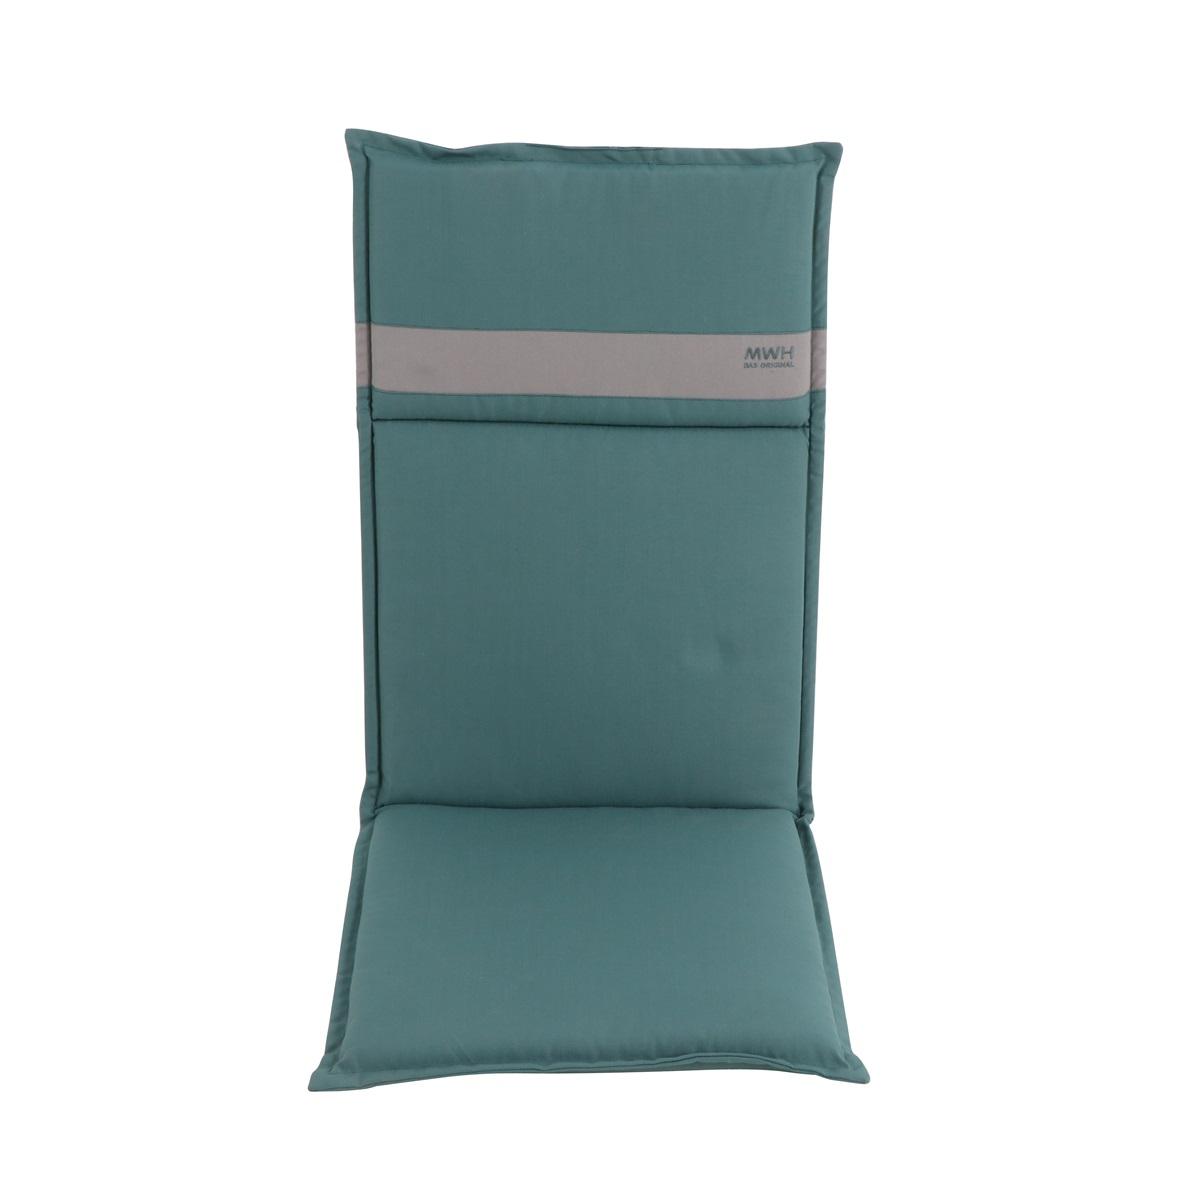 Polstr MWH Premium 120 x 50 cm